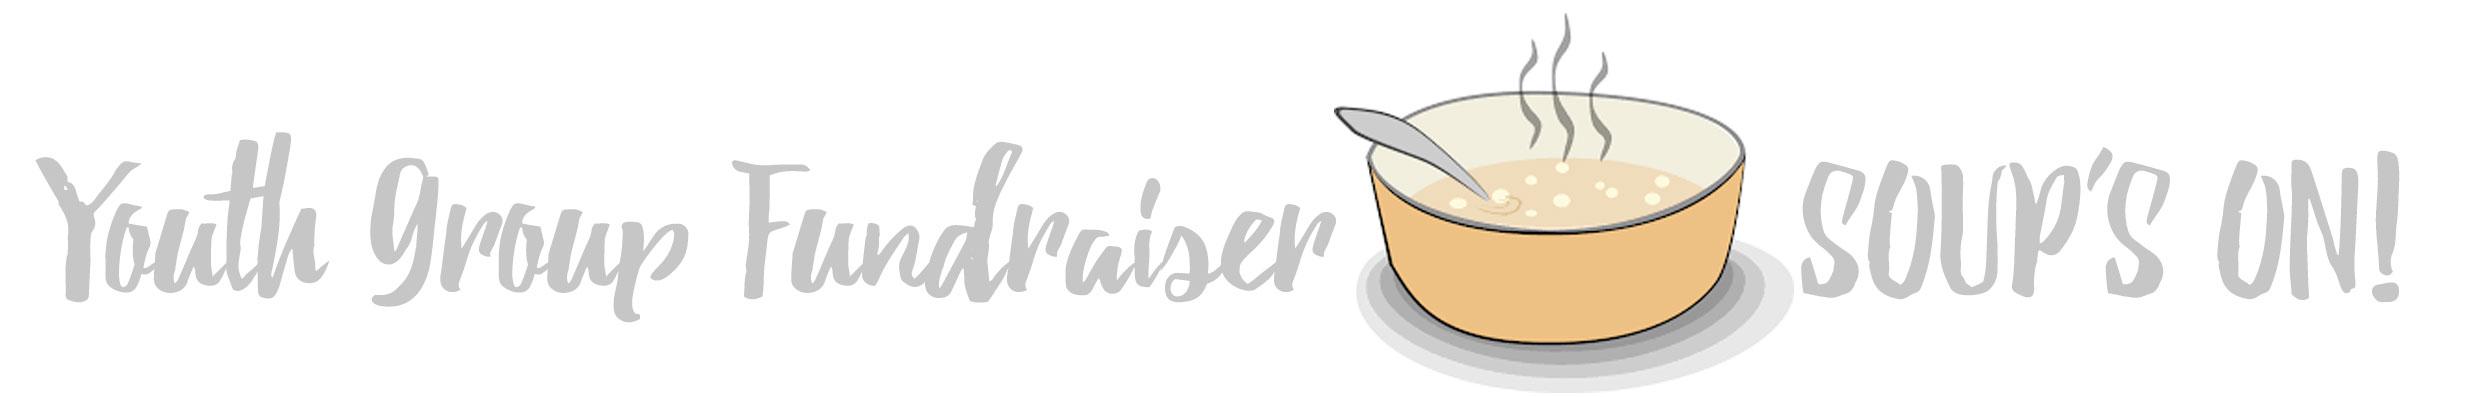 Soups-on-2.jpg